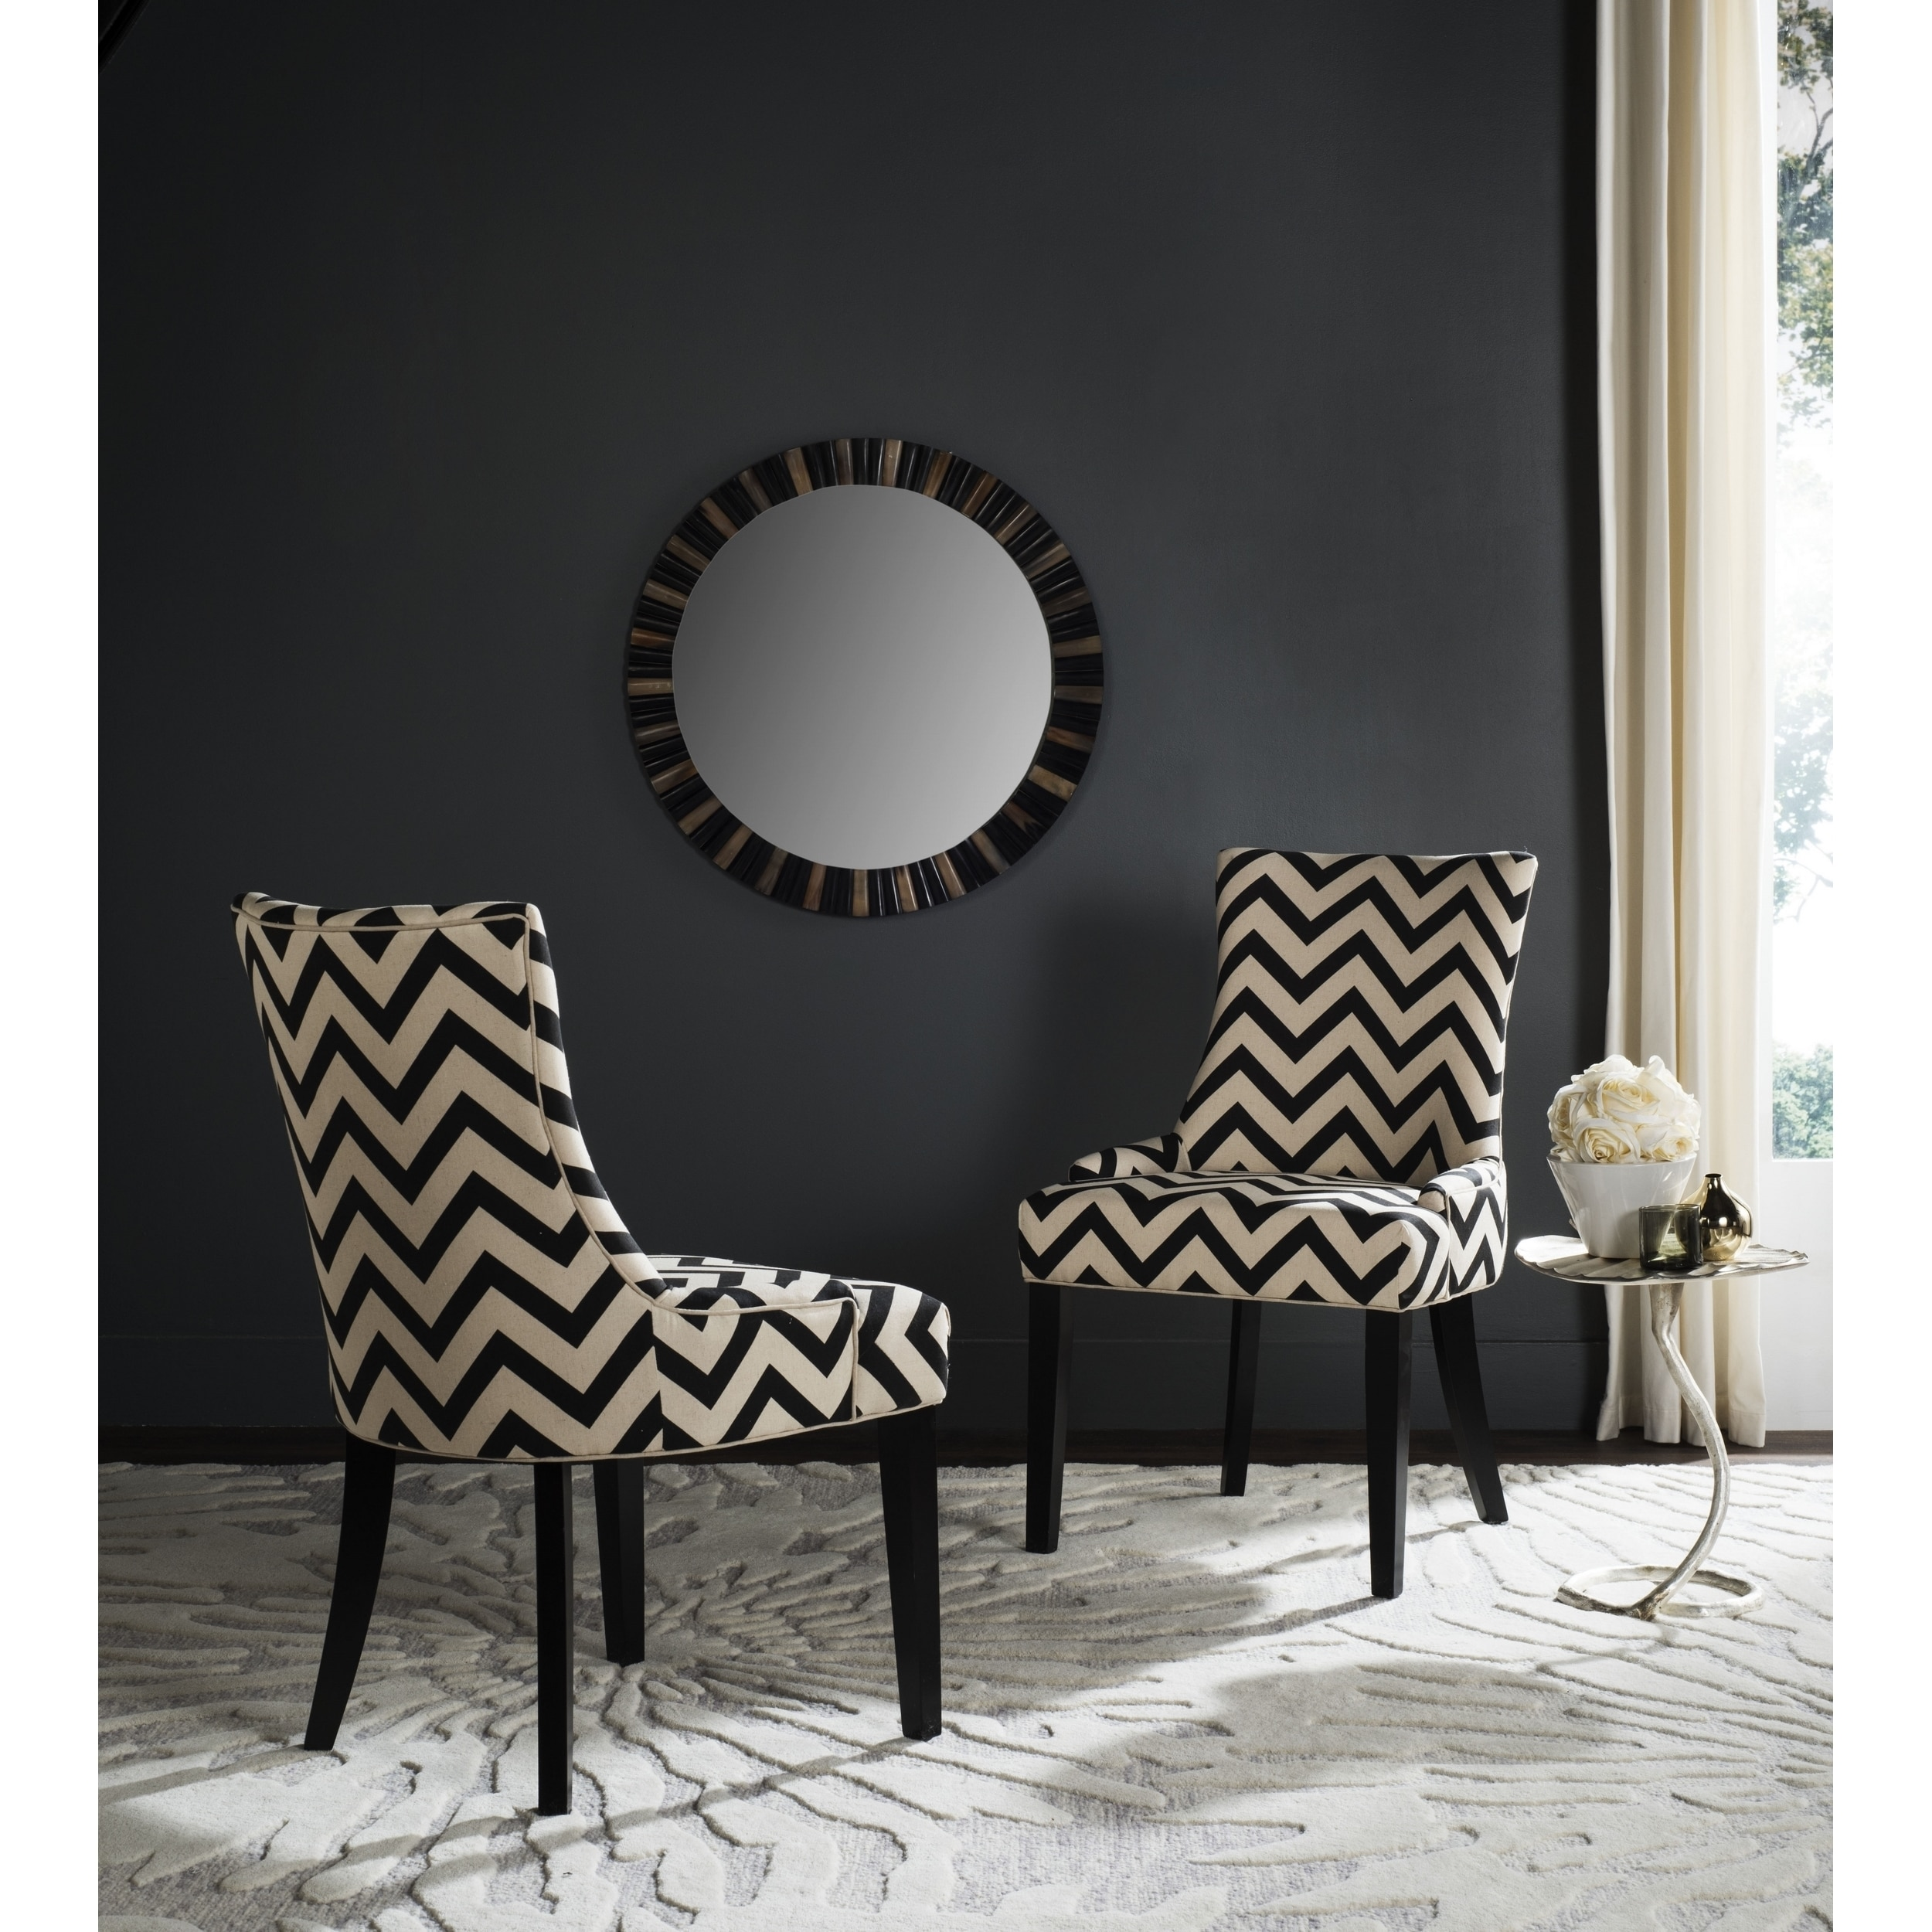 Marvelous Safavieh Dining Lester Black White Zig Zag Chevron Dining Chairs Set Of 2 Bralicious Painted Fabric Chair Ideas Braliciousco